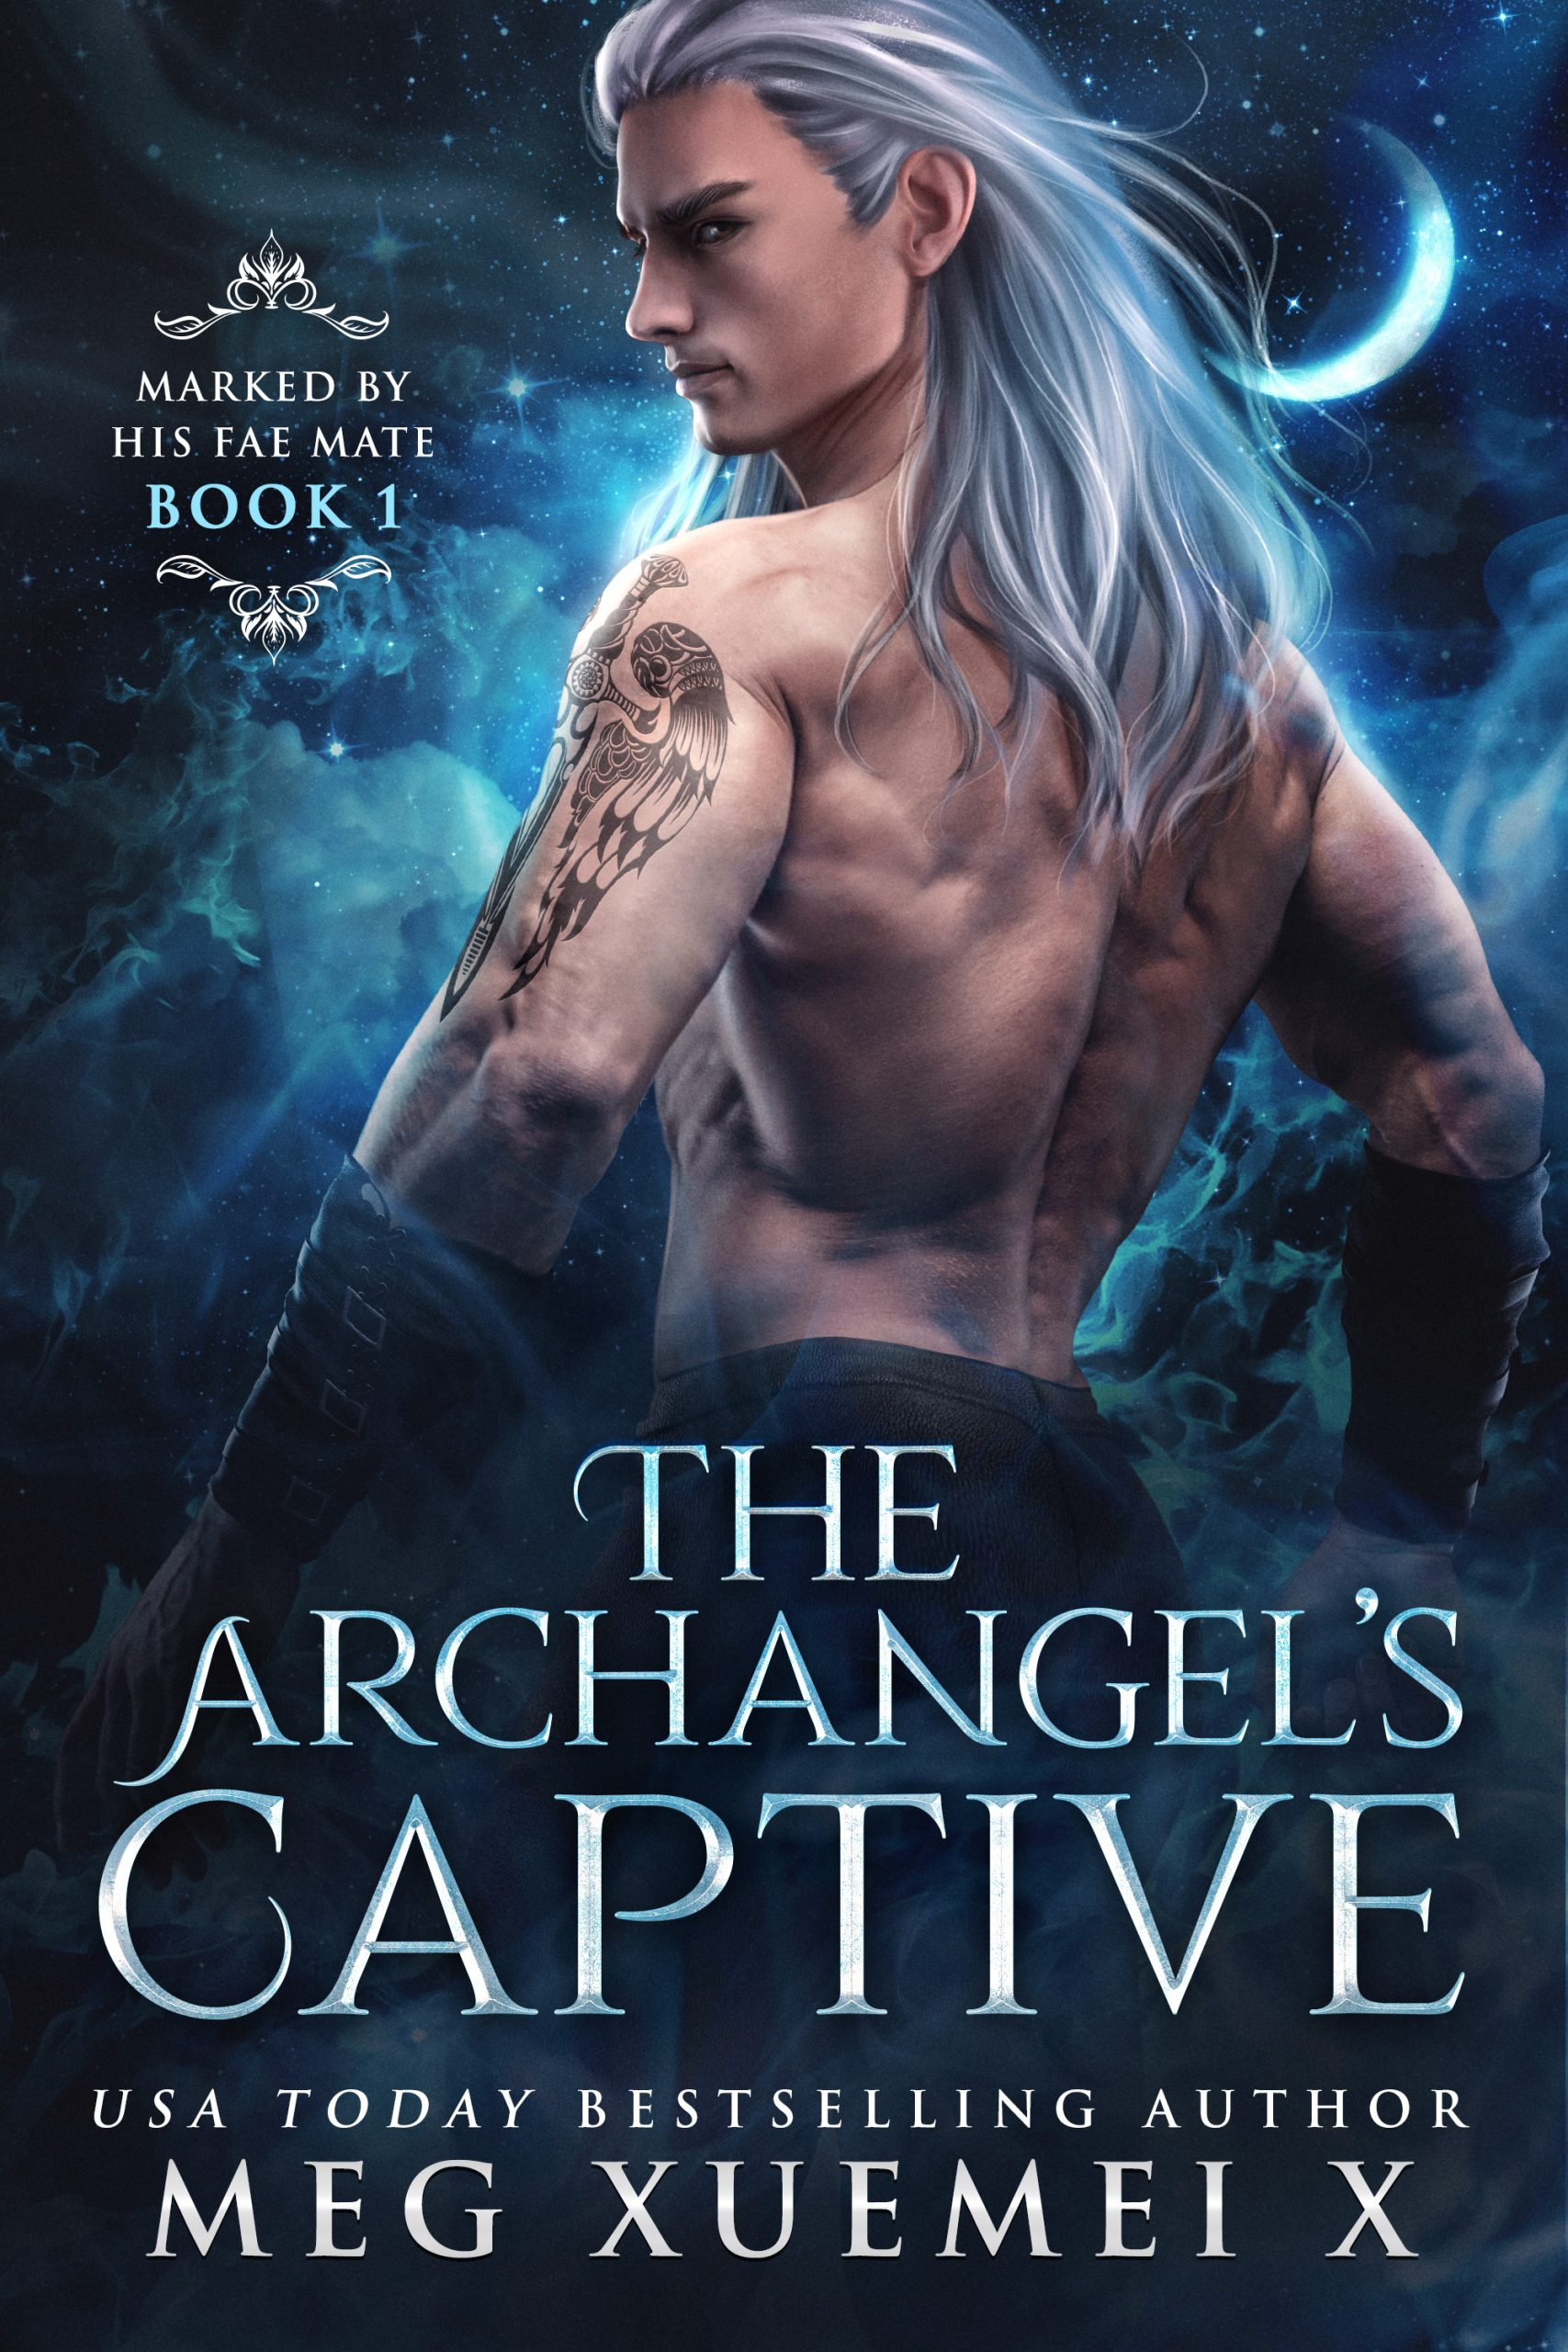 The Archangel's Captive